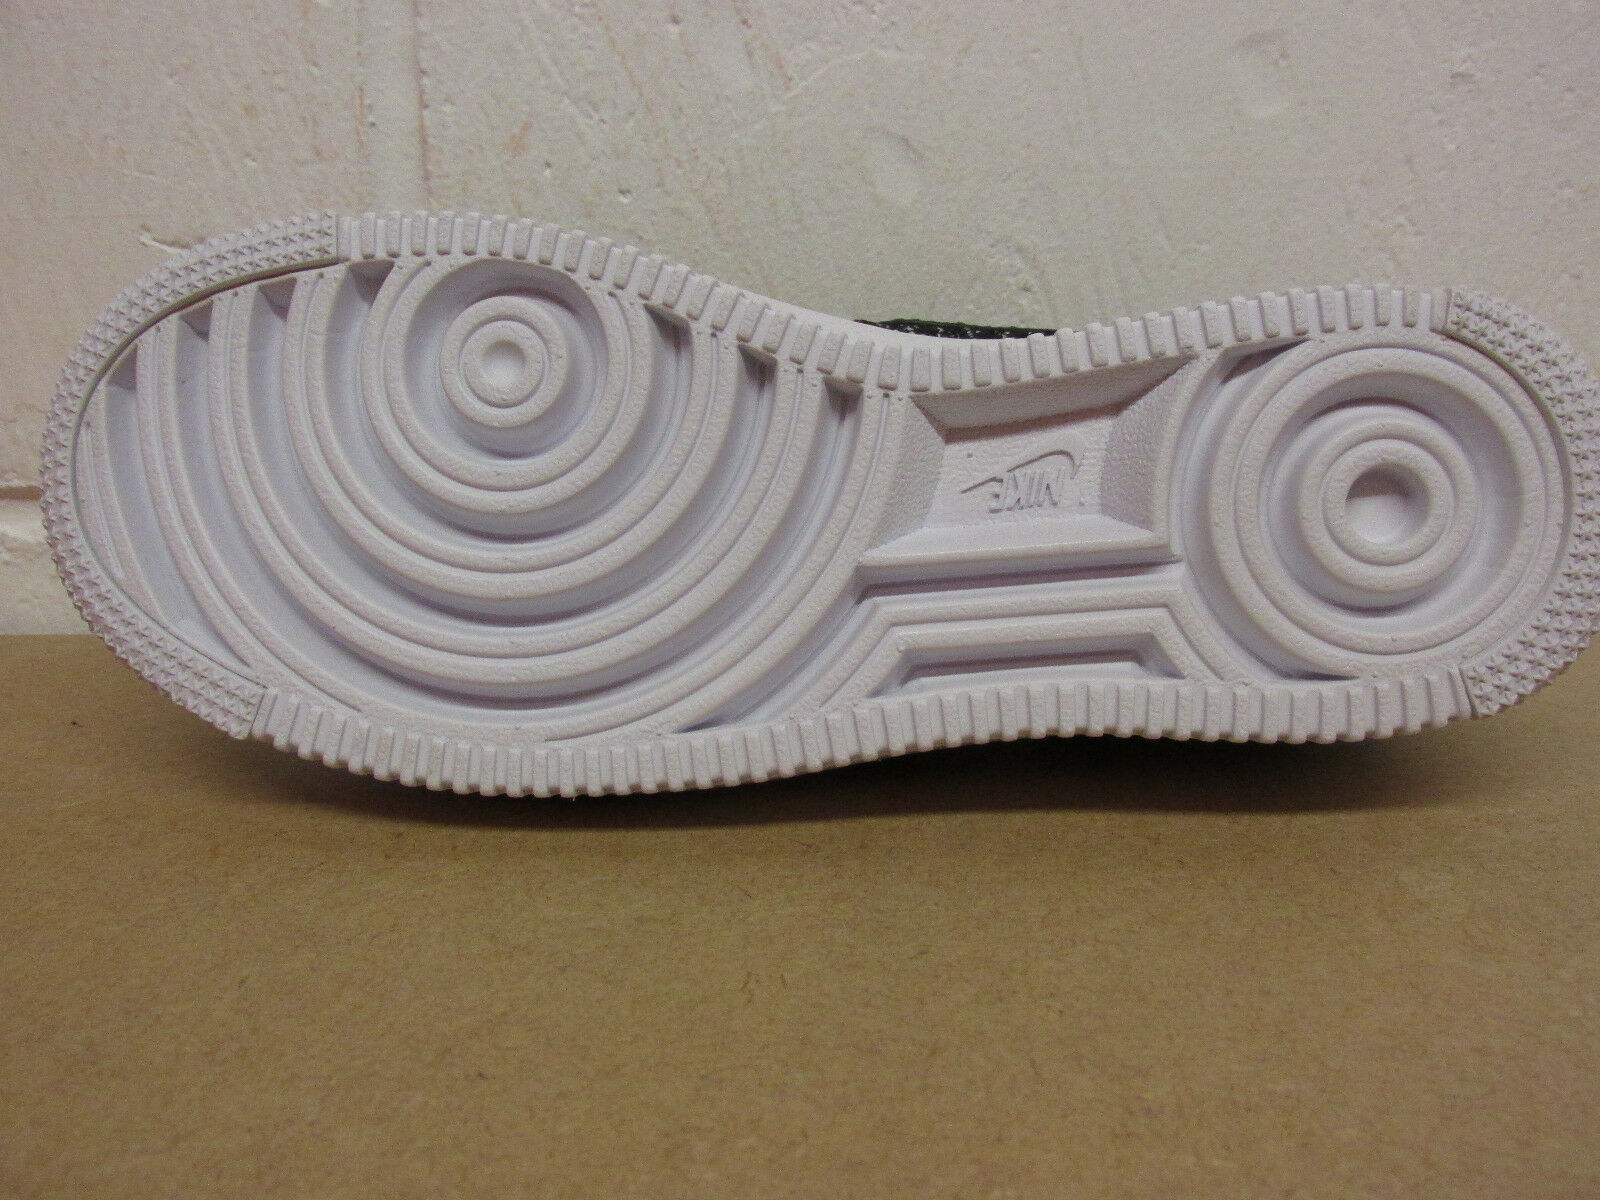 Nike Af1 Air Force 1 Ultra Flyknit zapatillas Running hombre 853880 001 UK 5.5 US 6 EU 38.5